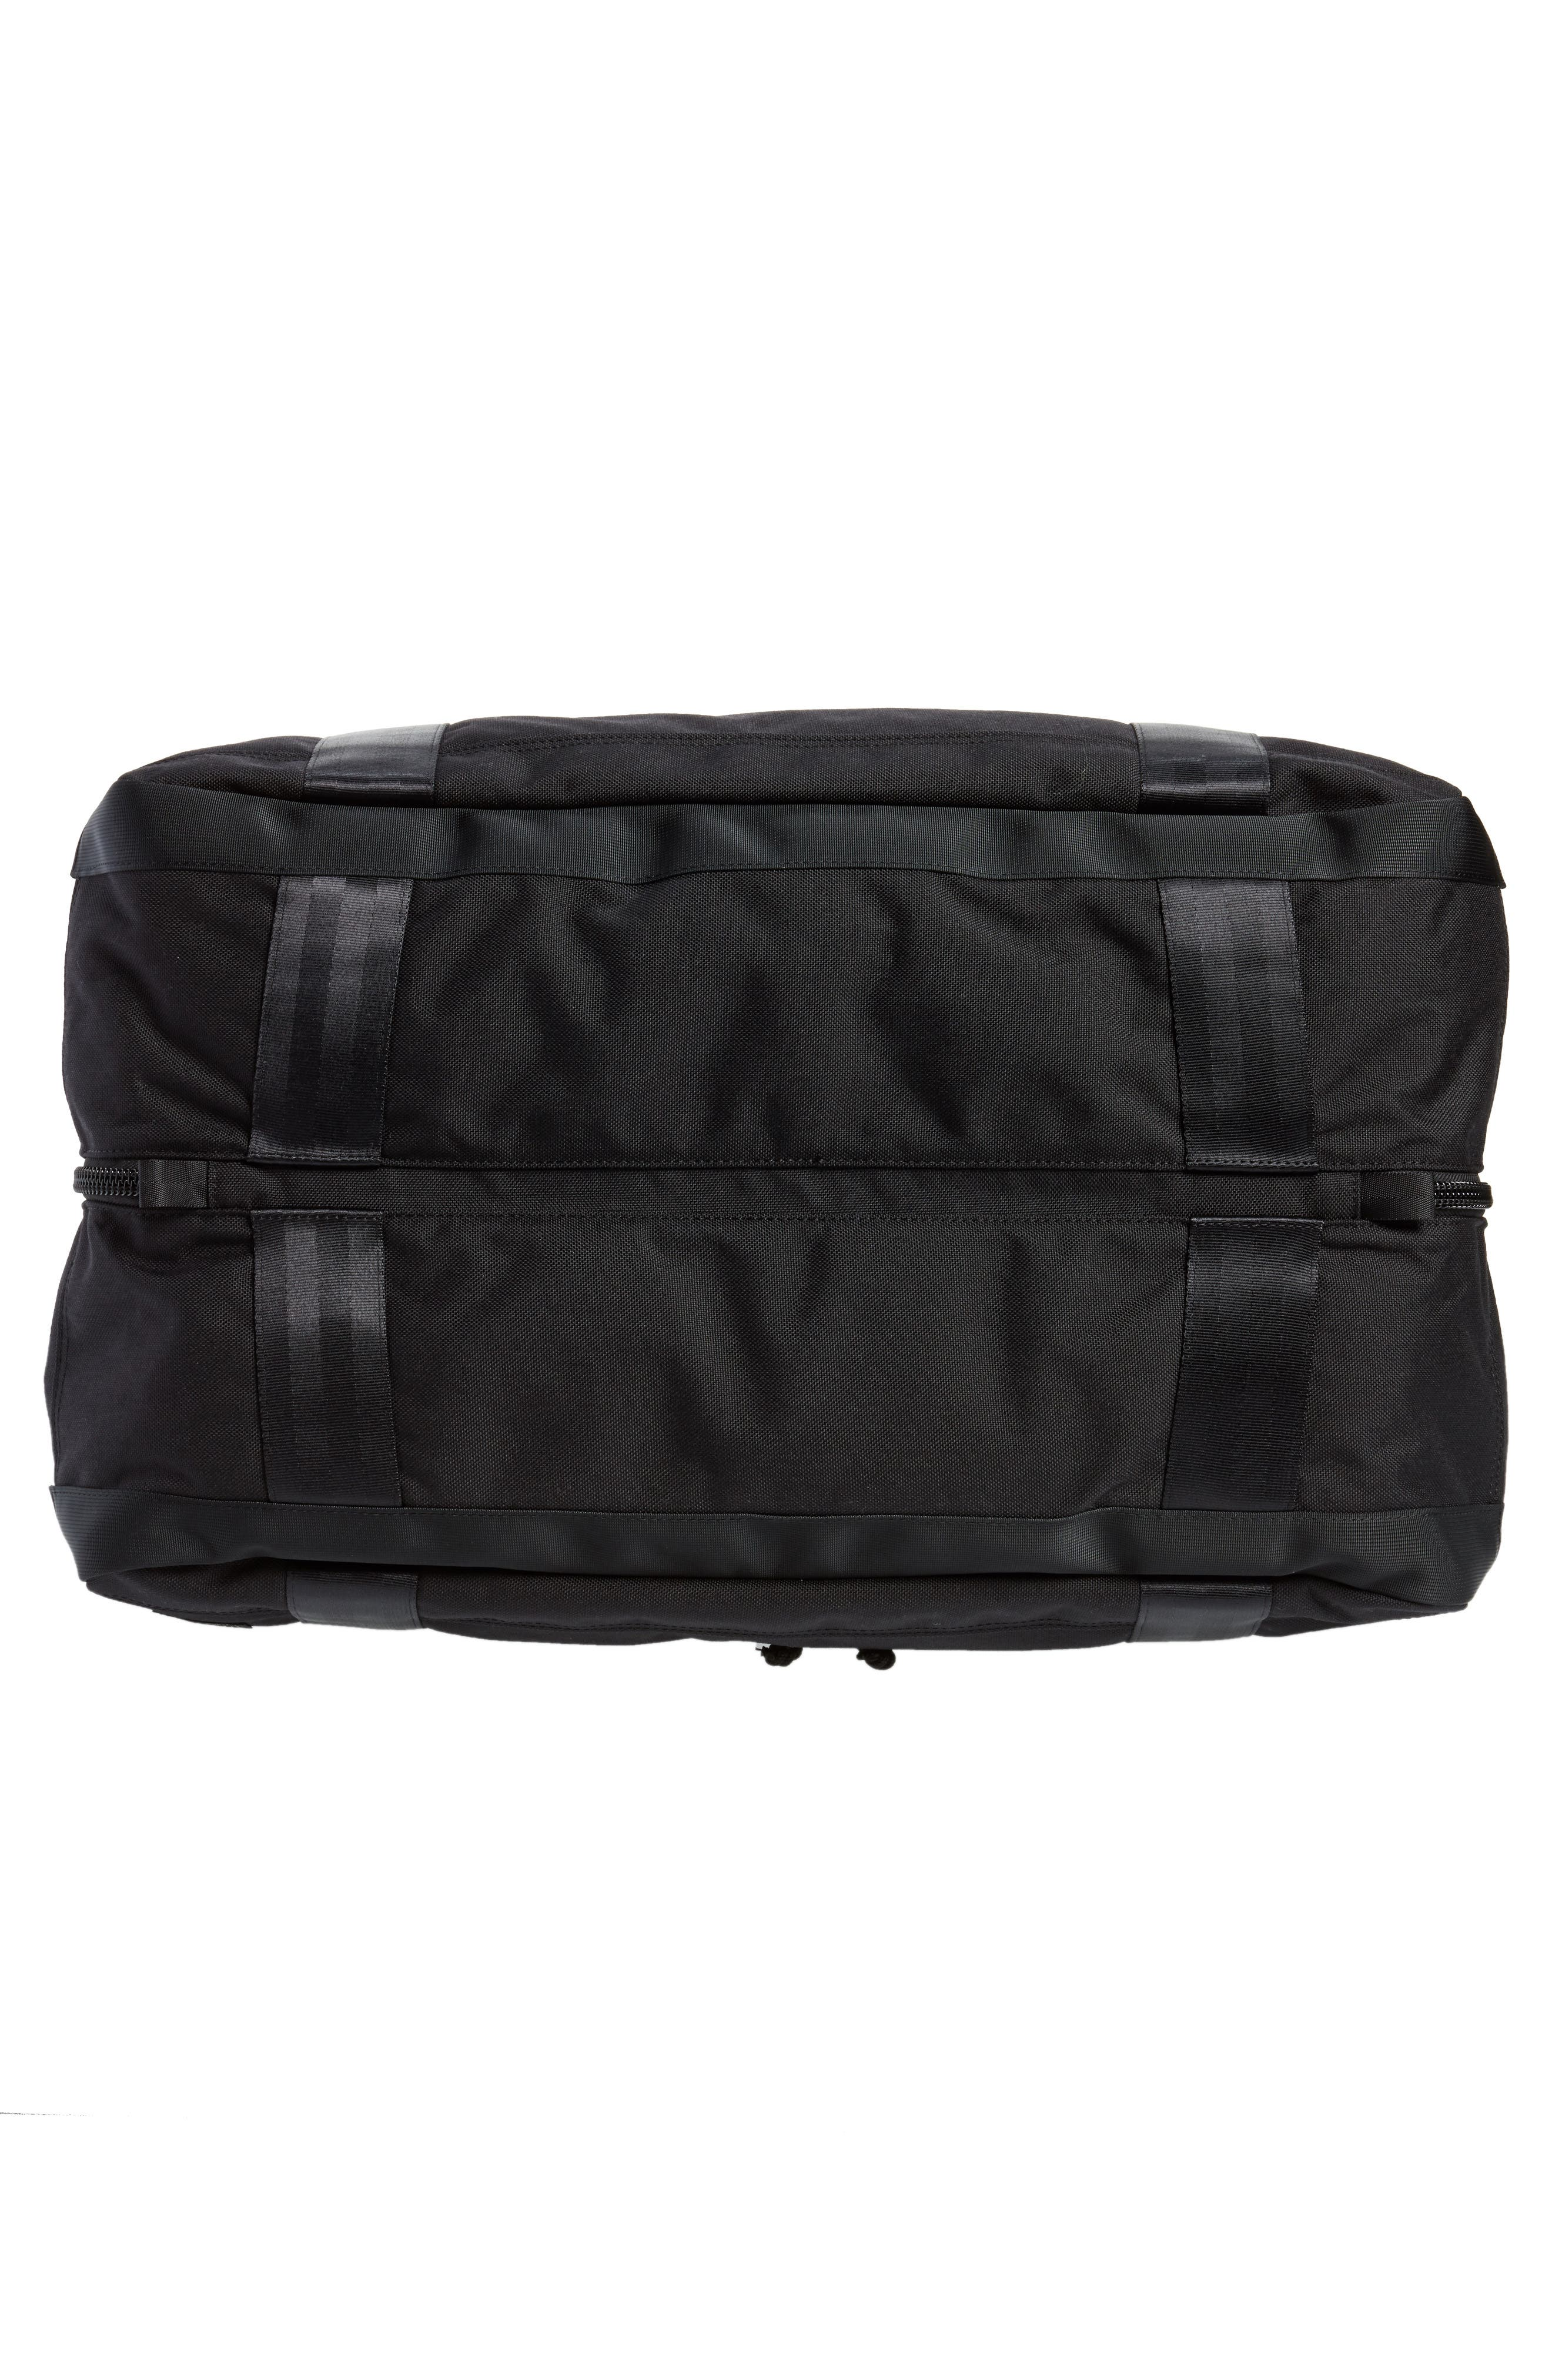 Porter-Yoshida & Co. Boothpack Convertible Duffel Bag,                             Alternate thumbnail 7, color,                             BLACK